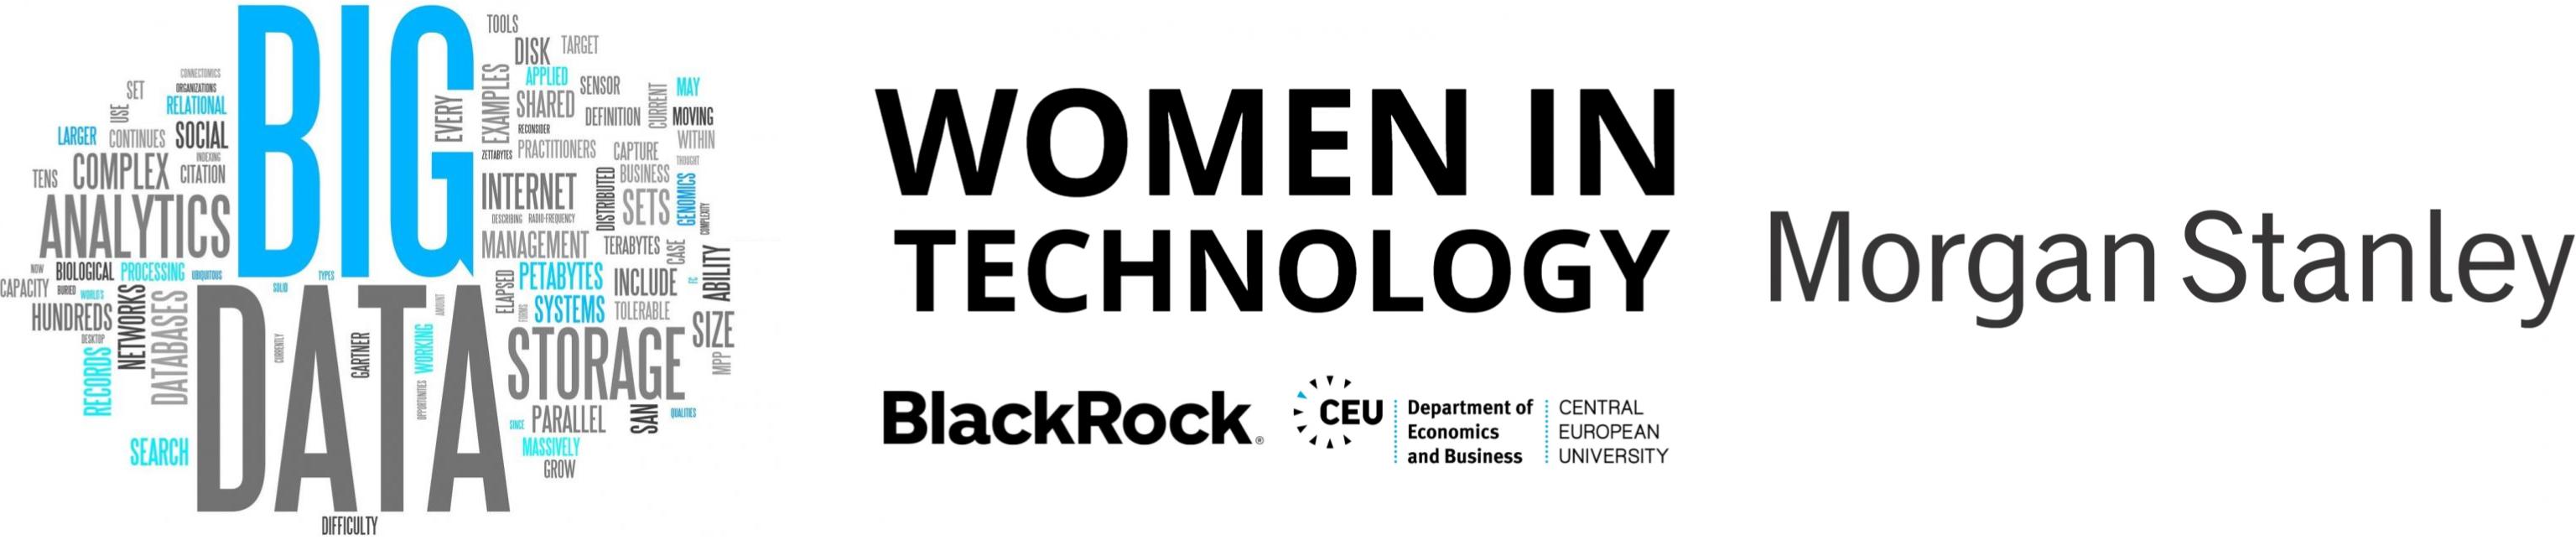 CEU Scholarships Future of Big Data Women in Technology BlackRock Morgan Stanley MS in Business Analytics MS in Finance